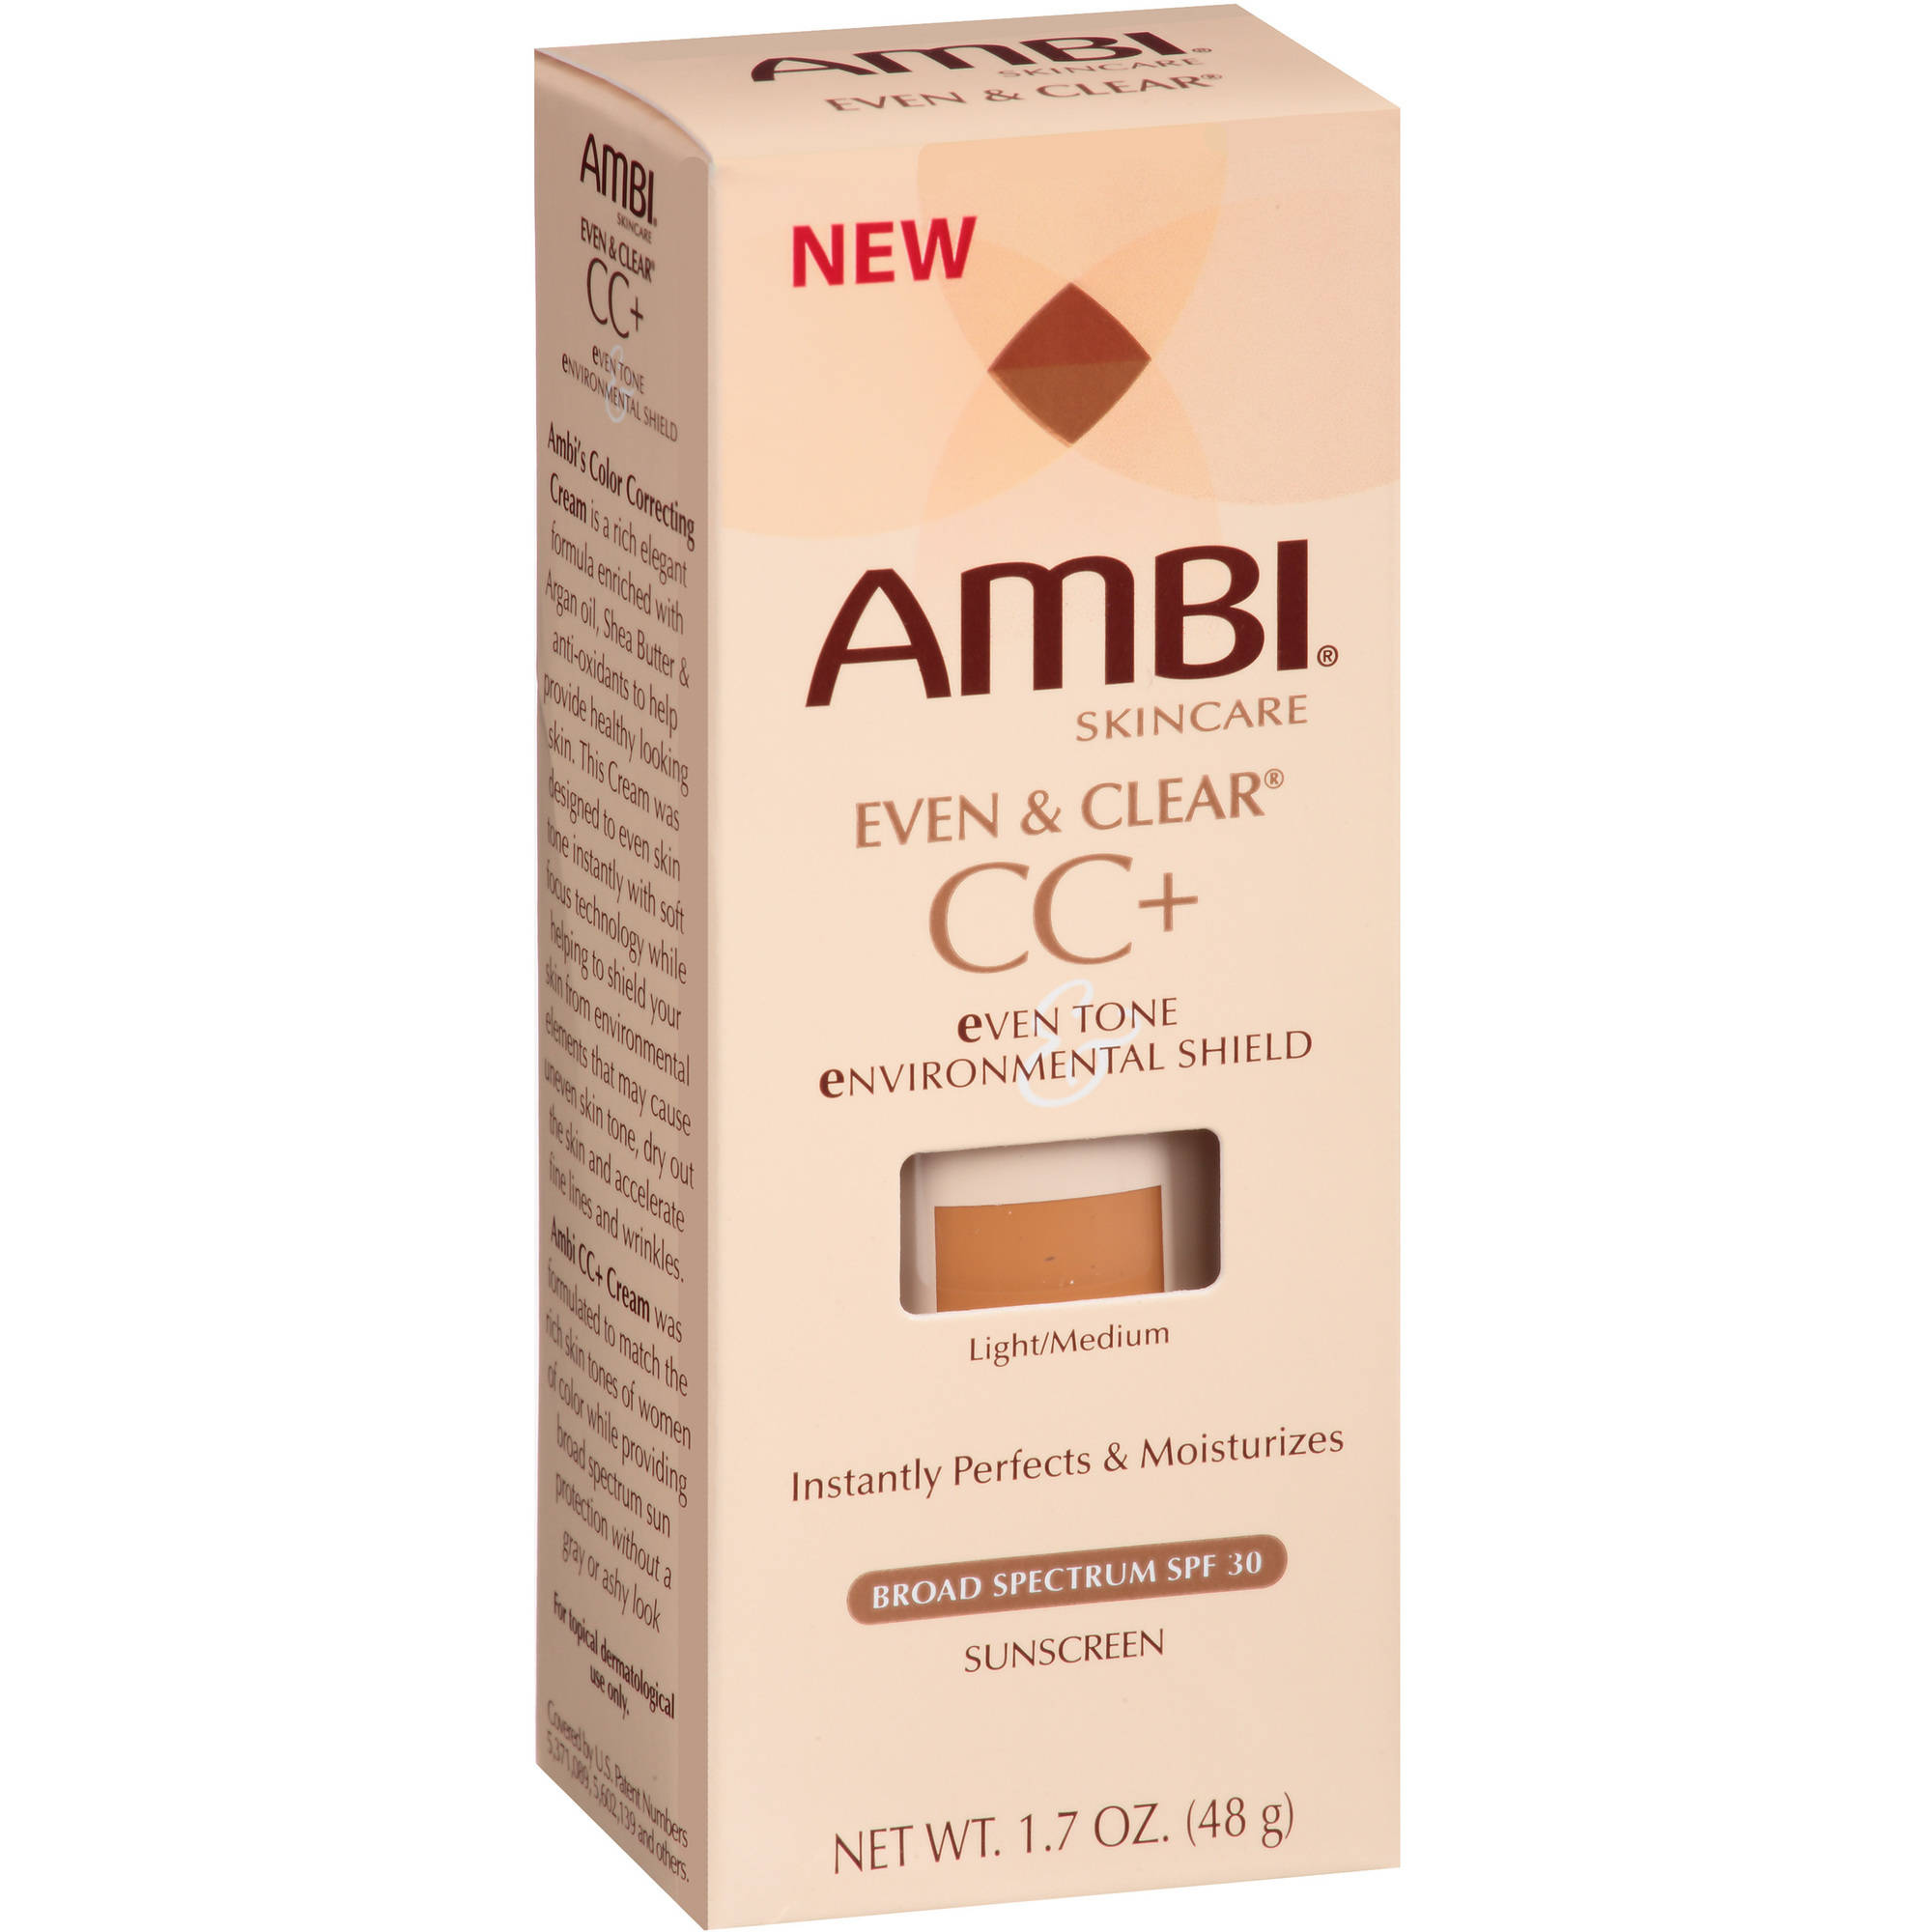 Ambi Even & Clear CC+ Light/Medium Sunscreen, SPF 30, 1.7 oz